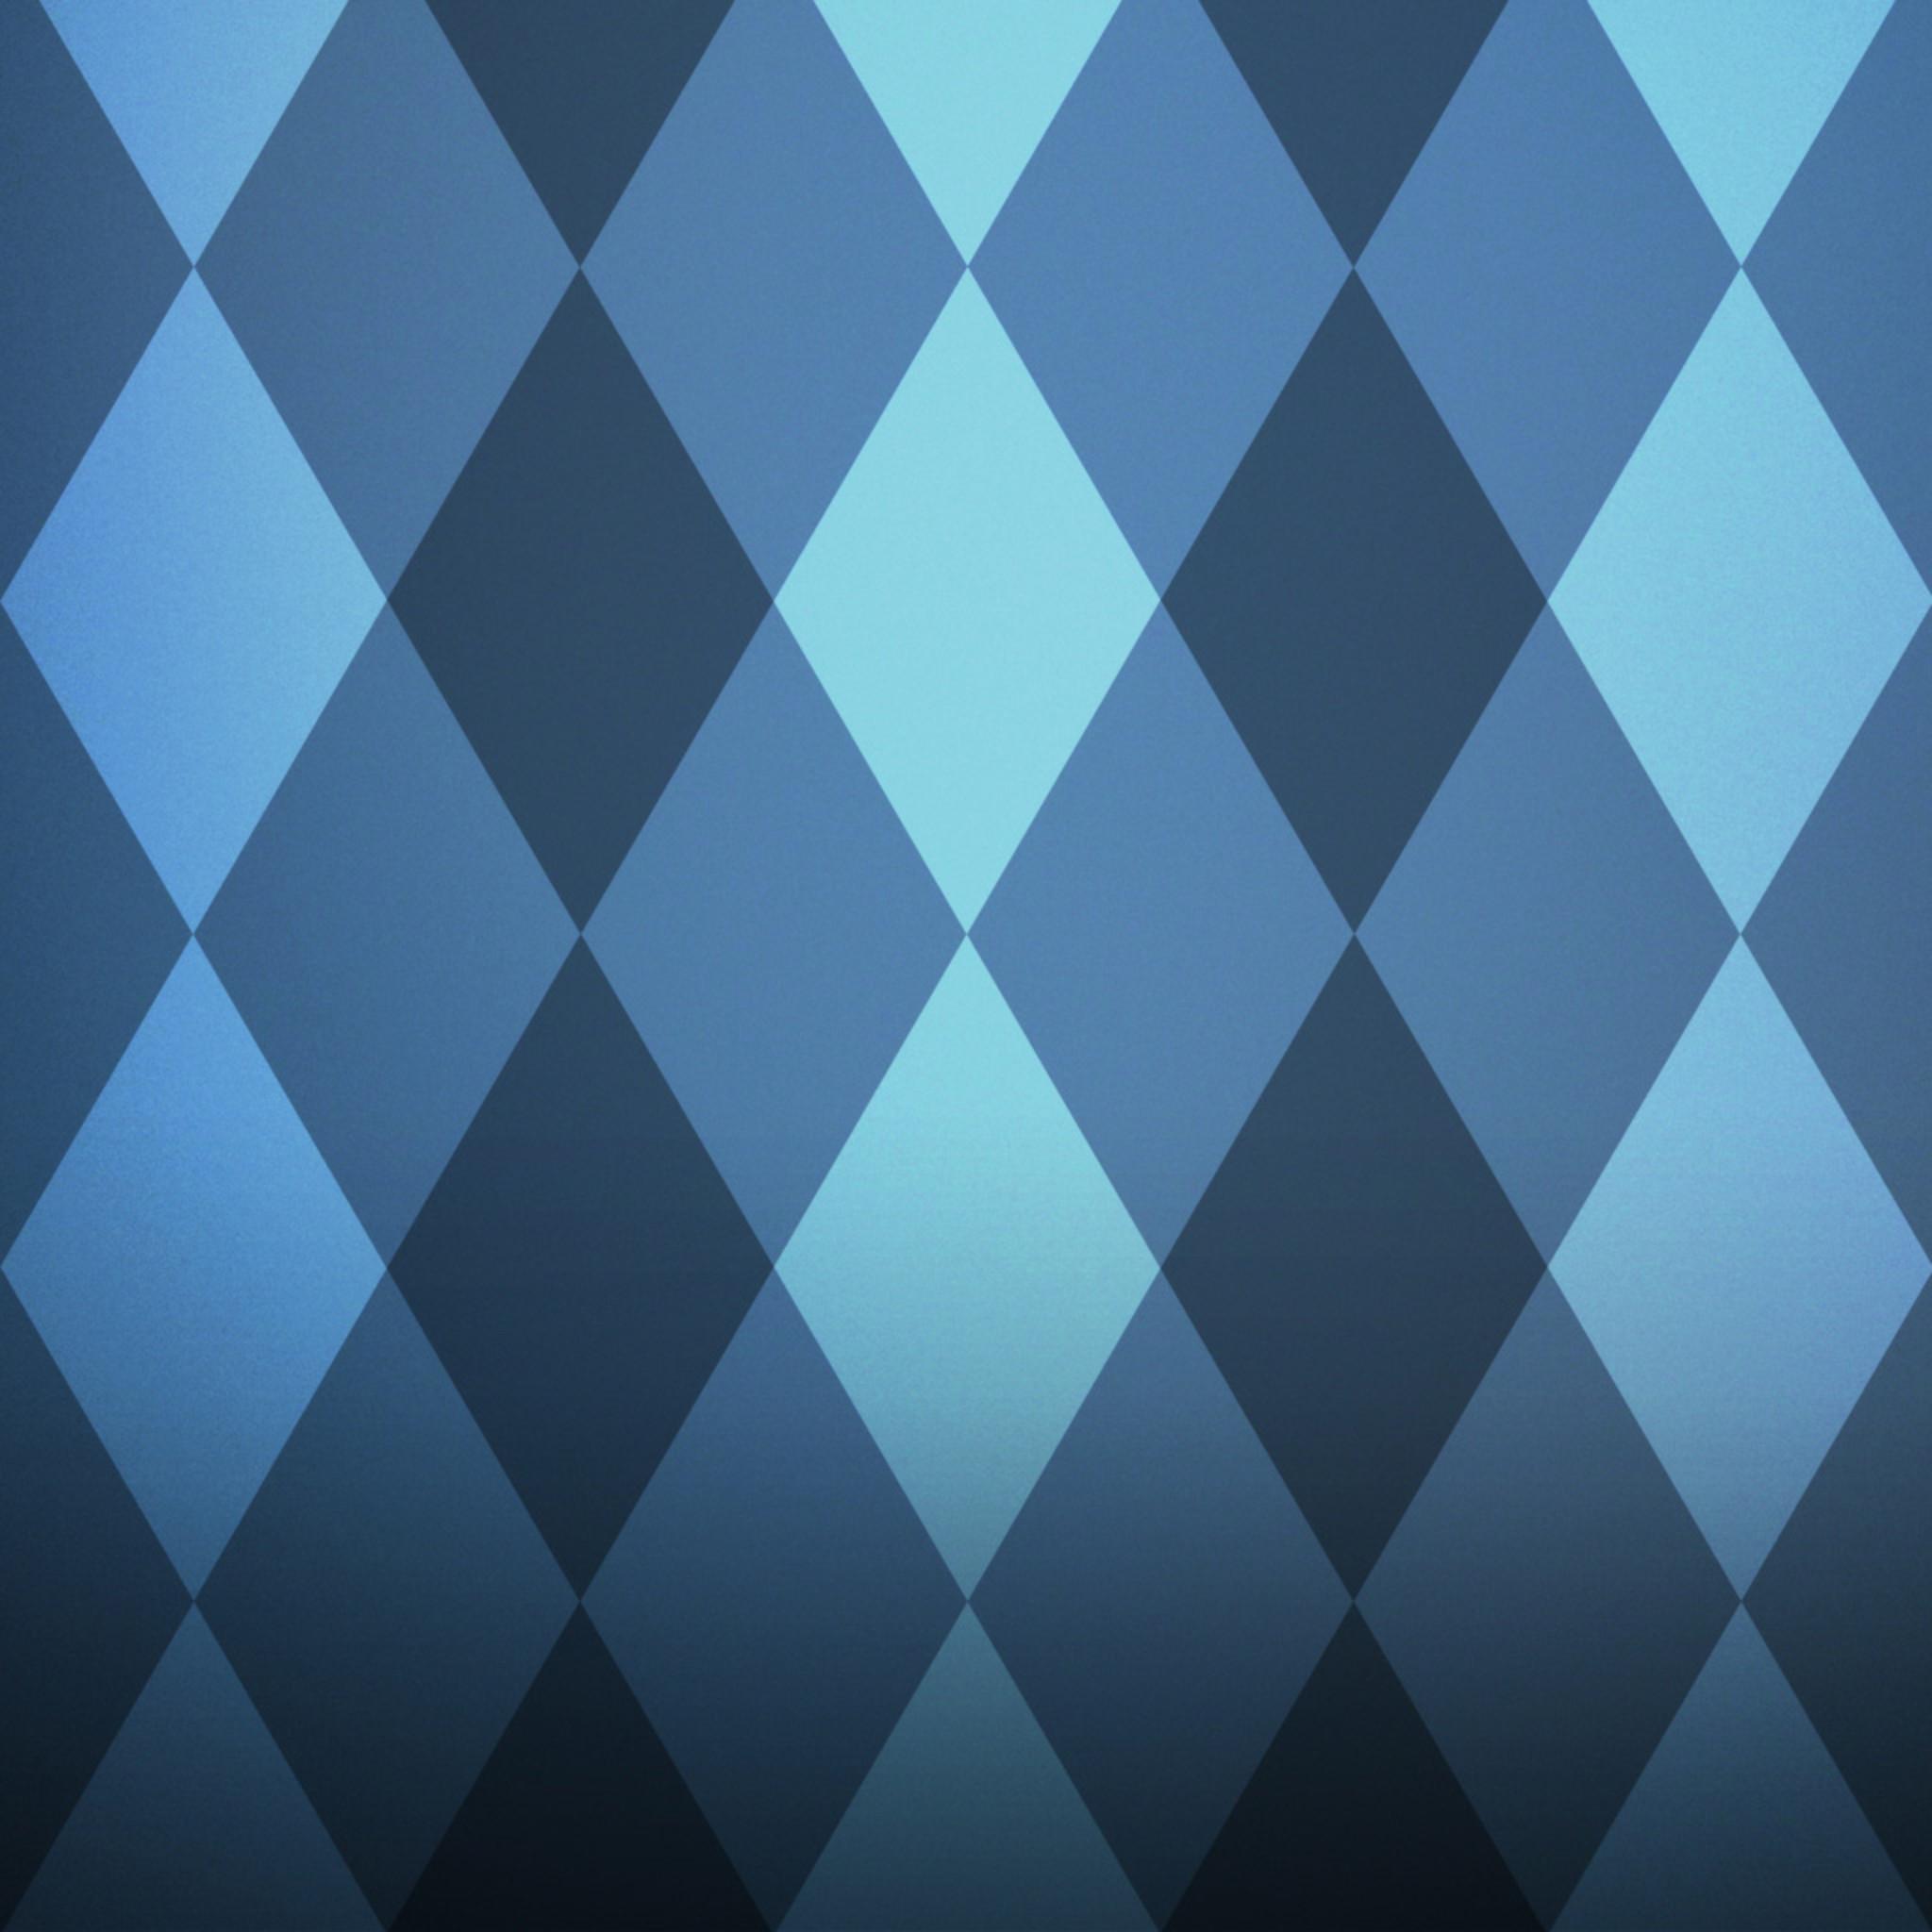 Surprising Diamond Shape Wallpaper 48 About Remodel Furniture Design with  Diamond Shape Wallpaper